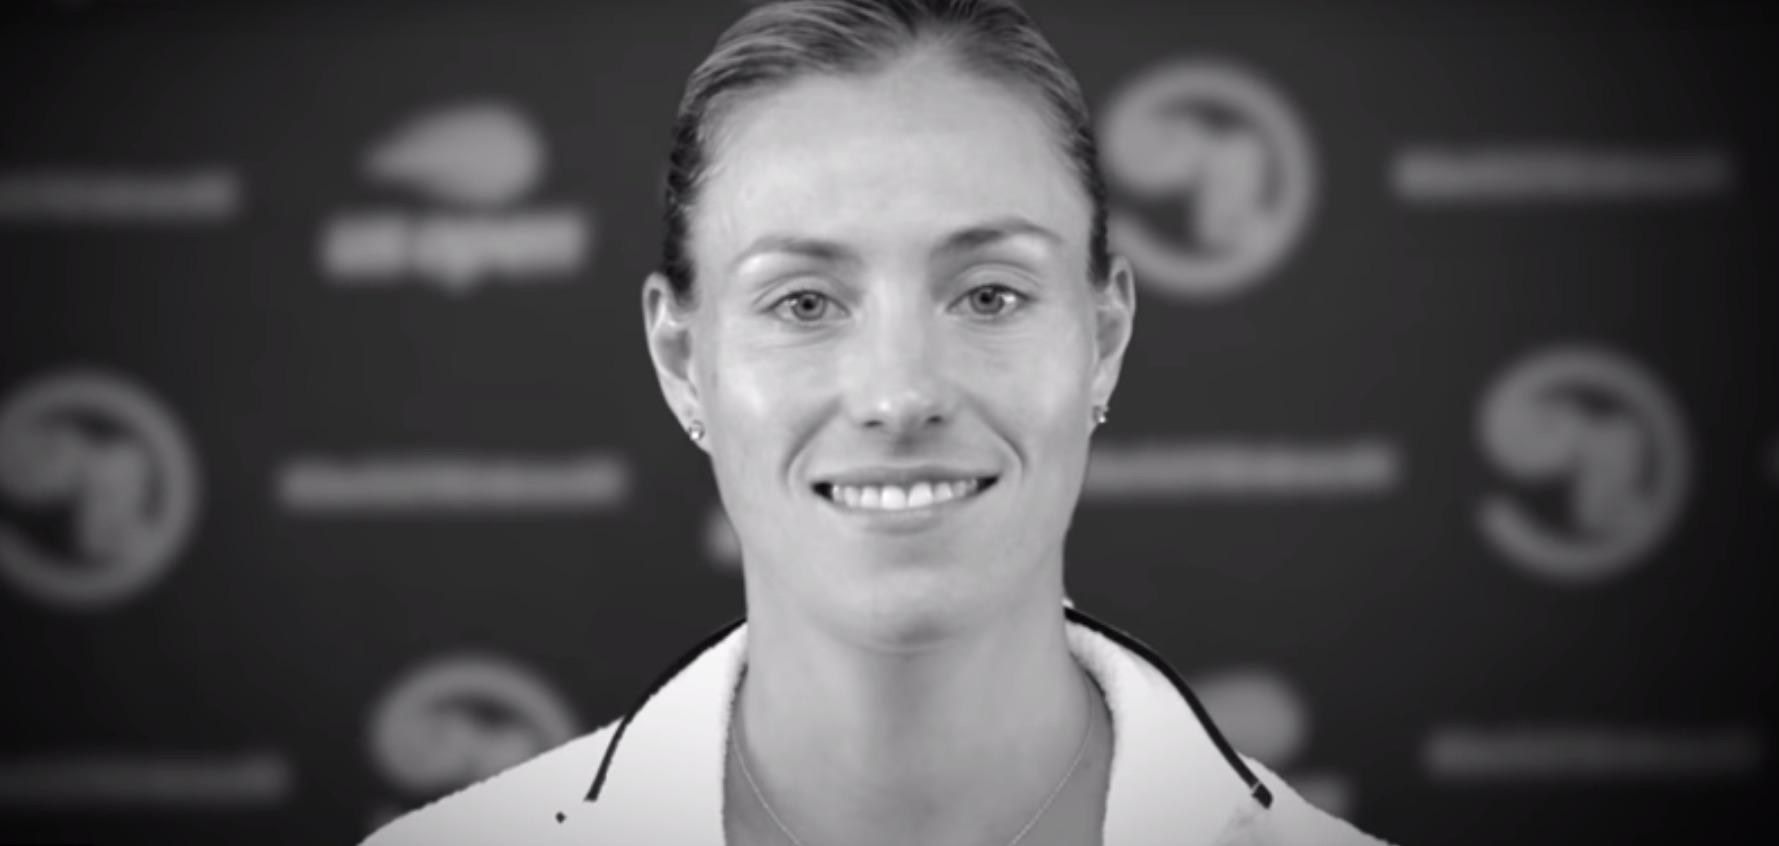 tennis_star_3.jpg